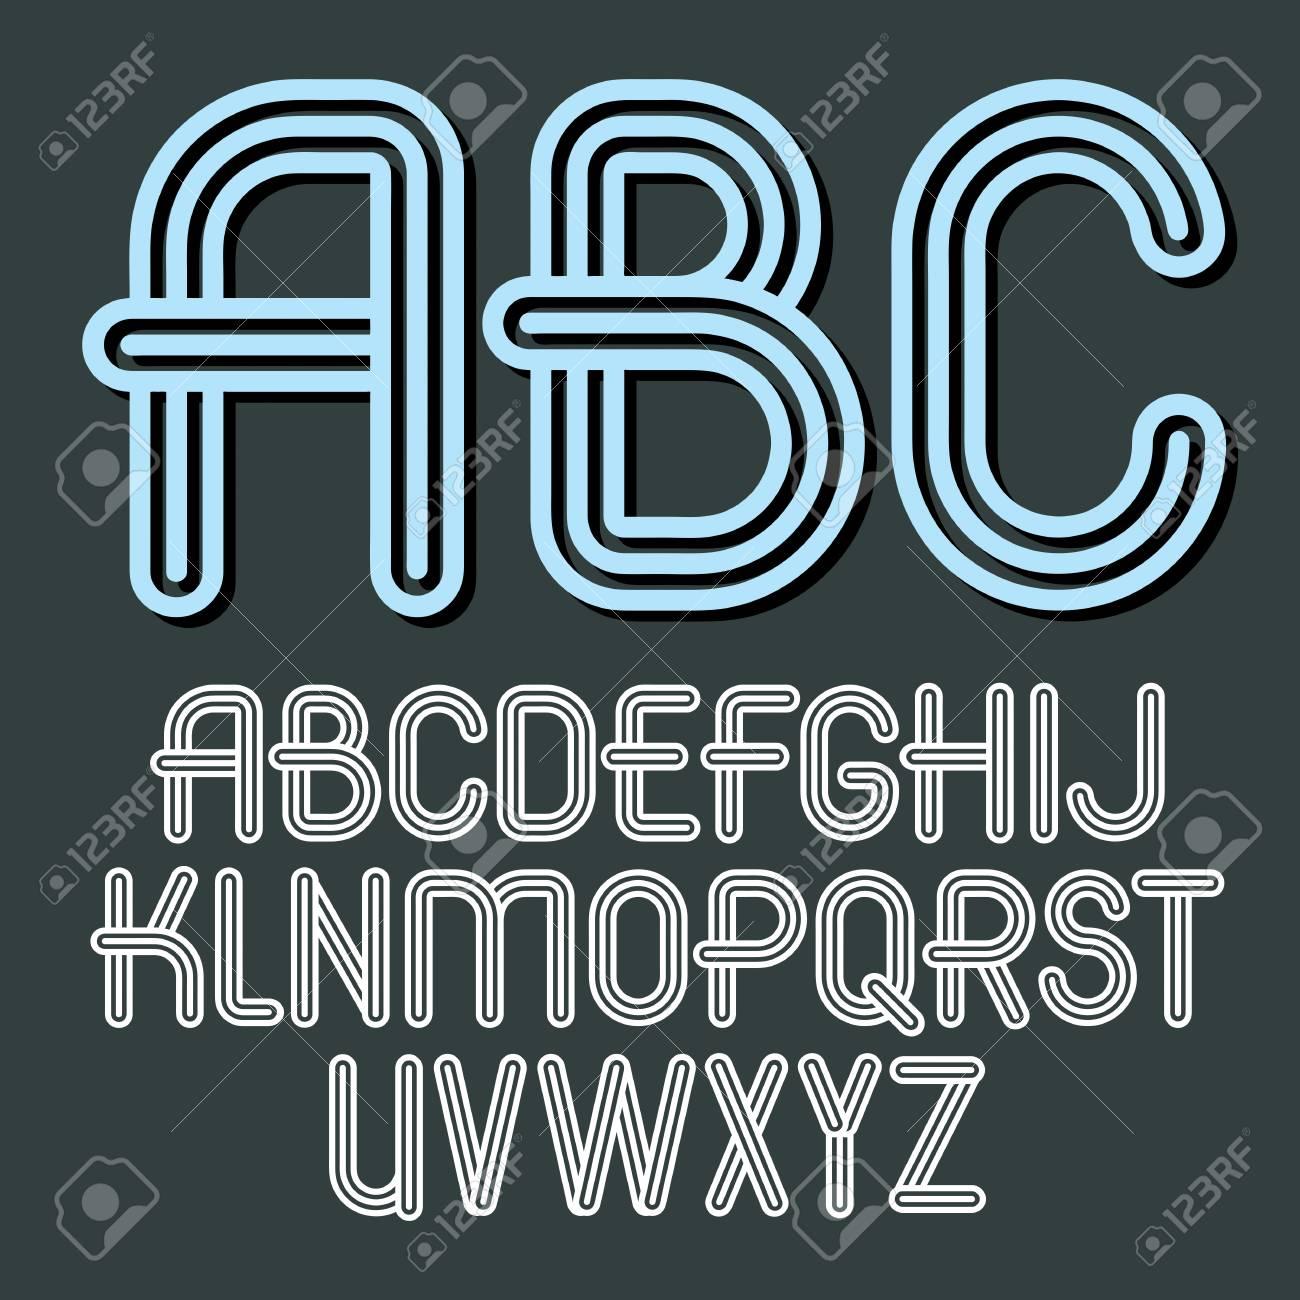 Abc Creation à set of trendy vector capital alphabet letters, abc isolated